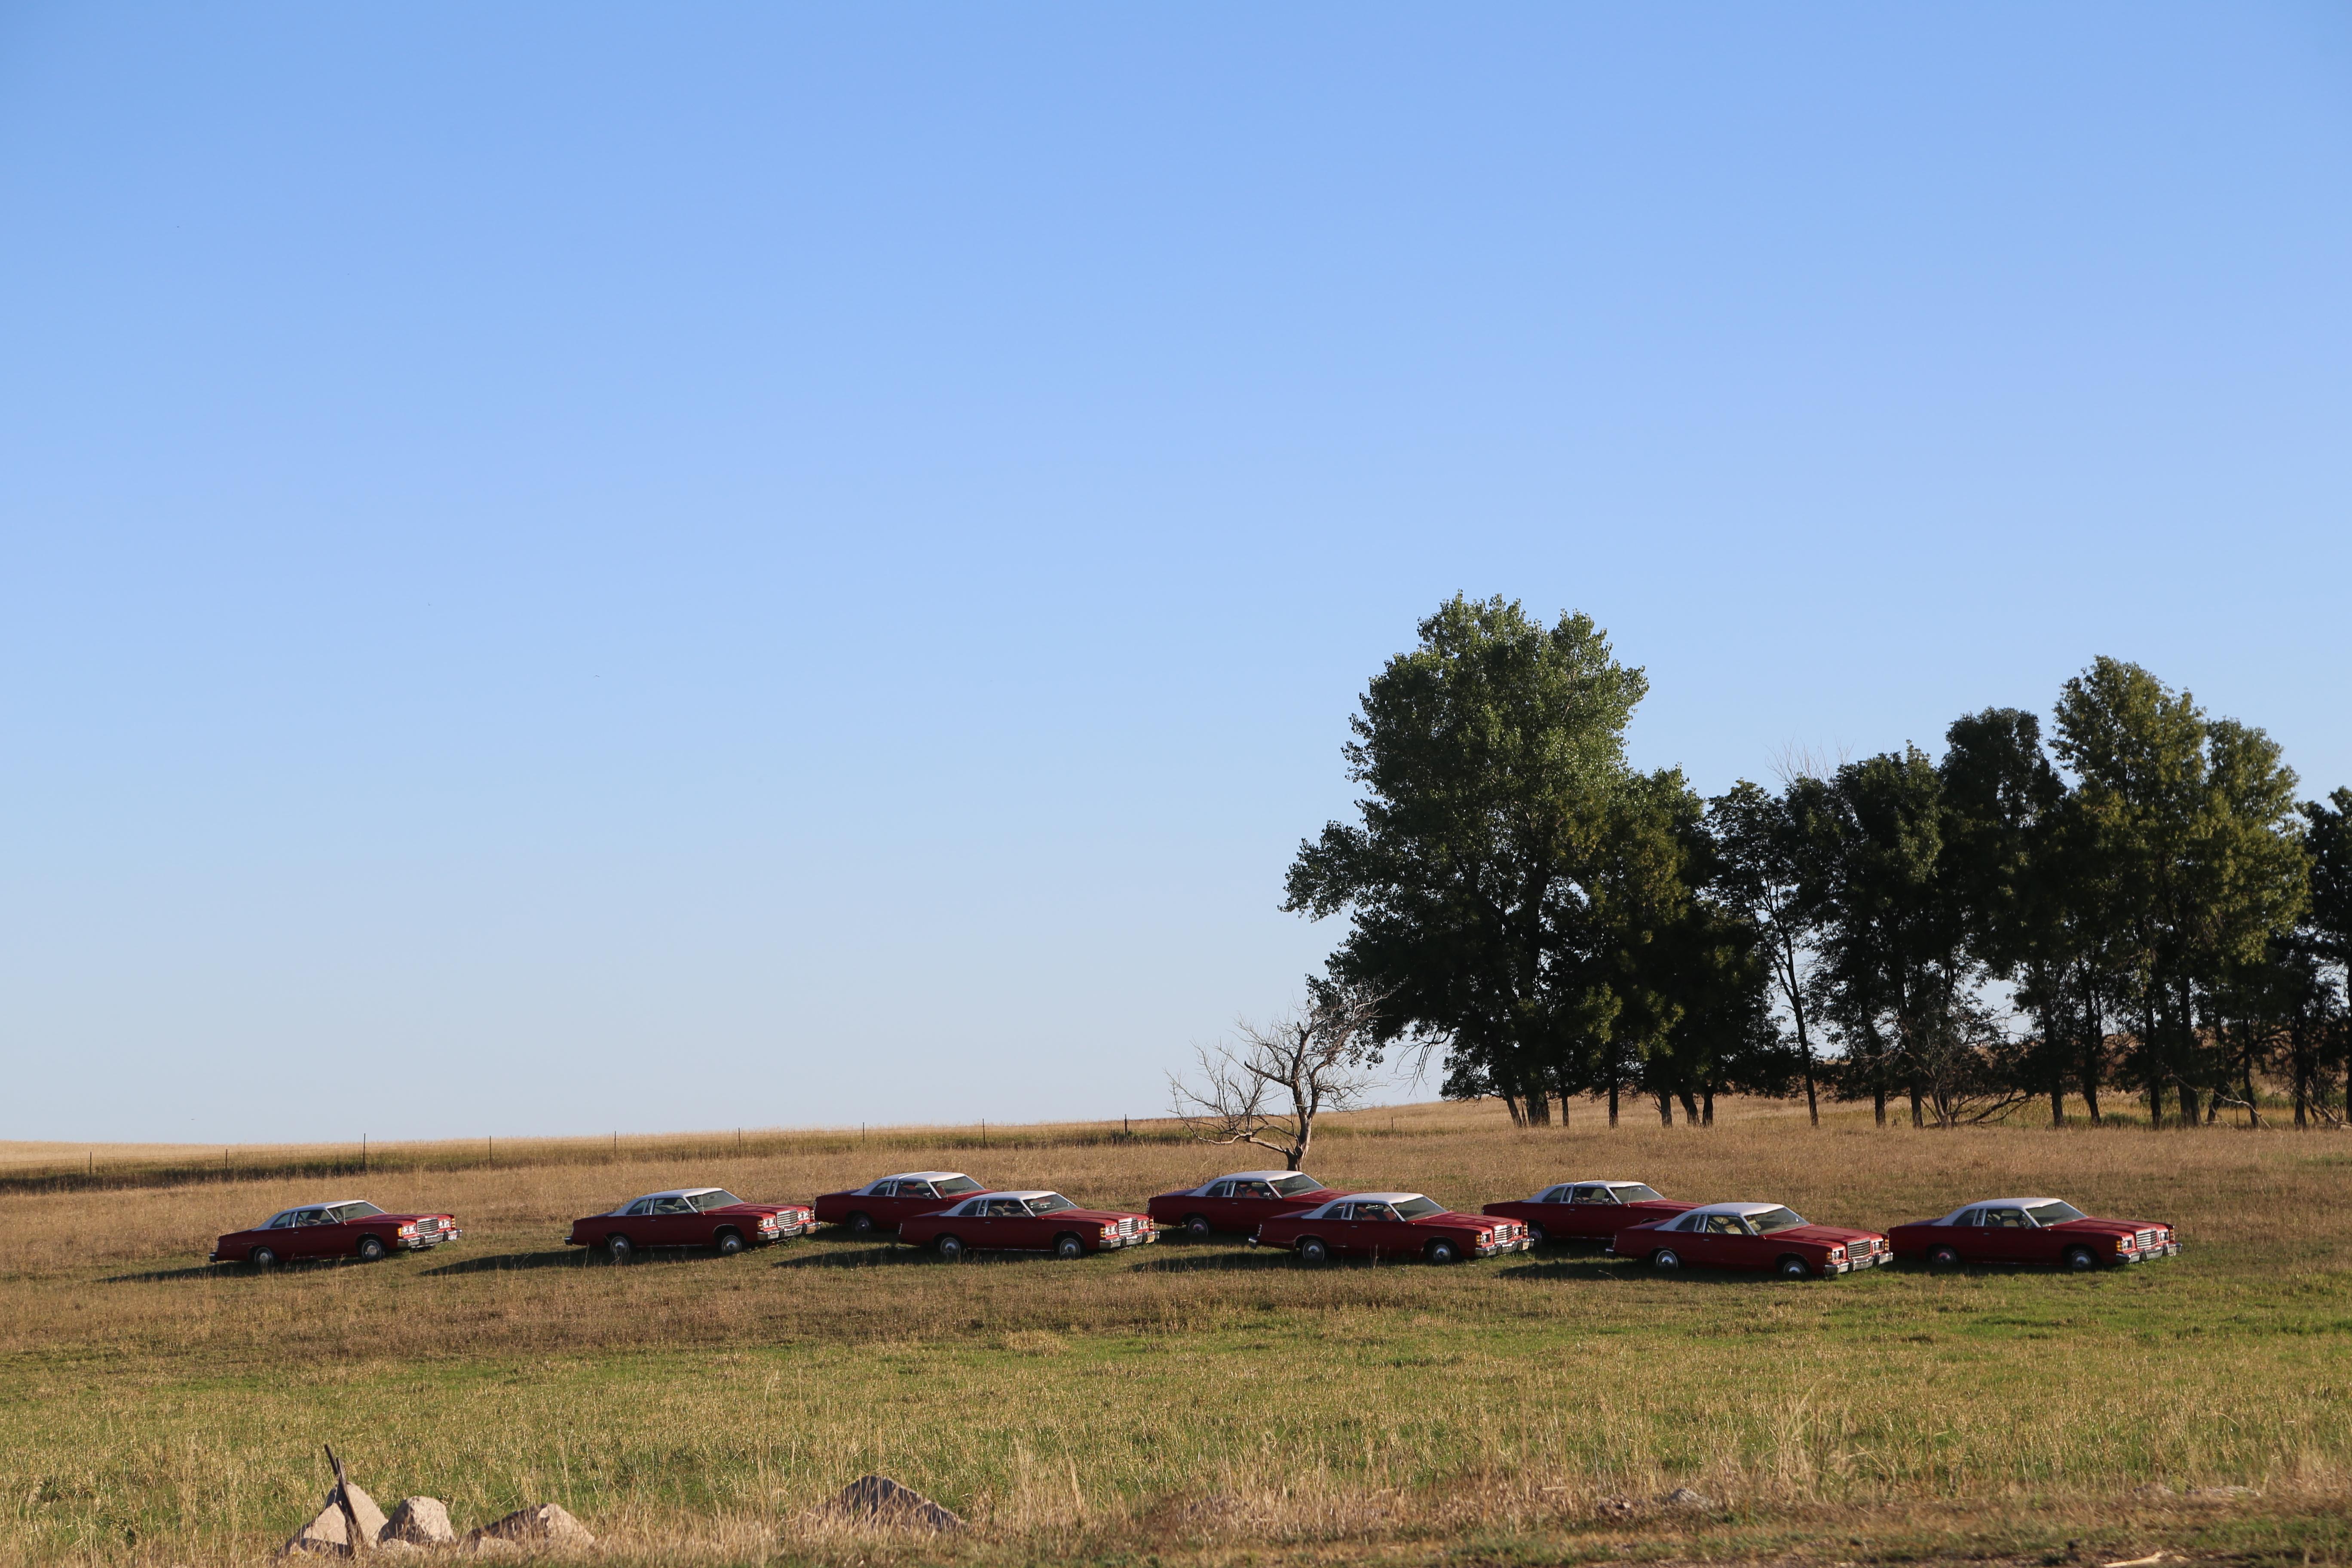 South dakota spink county doland - Sd Rt 212 Clark Co Sd